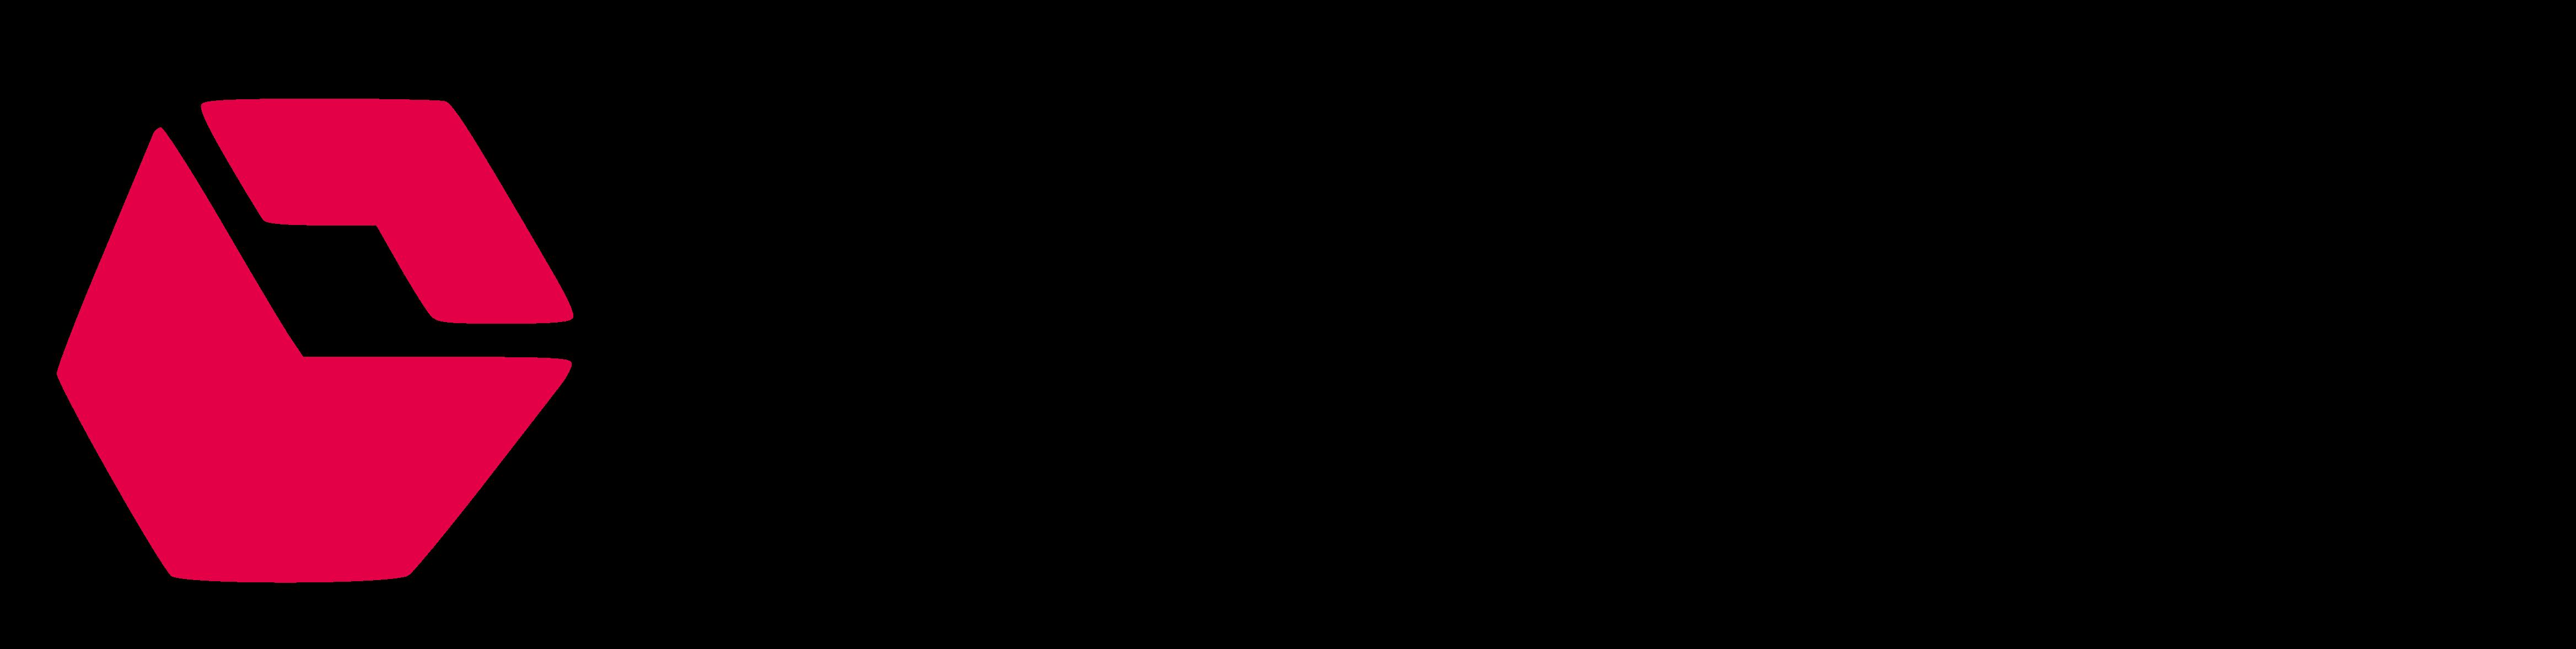 Snapdeal Voucher Codes